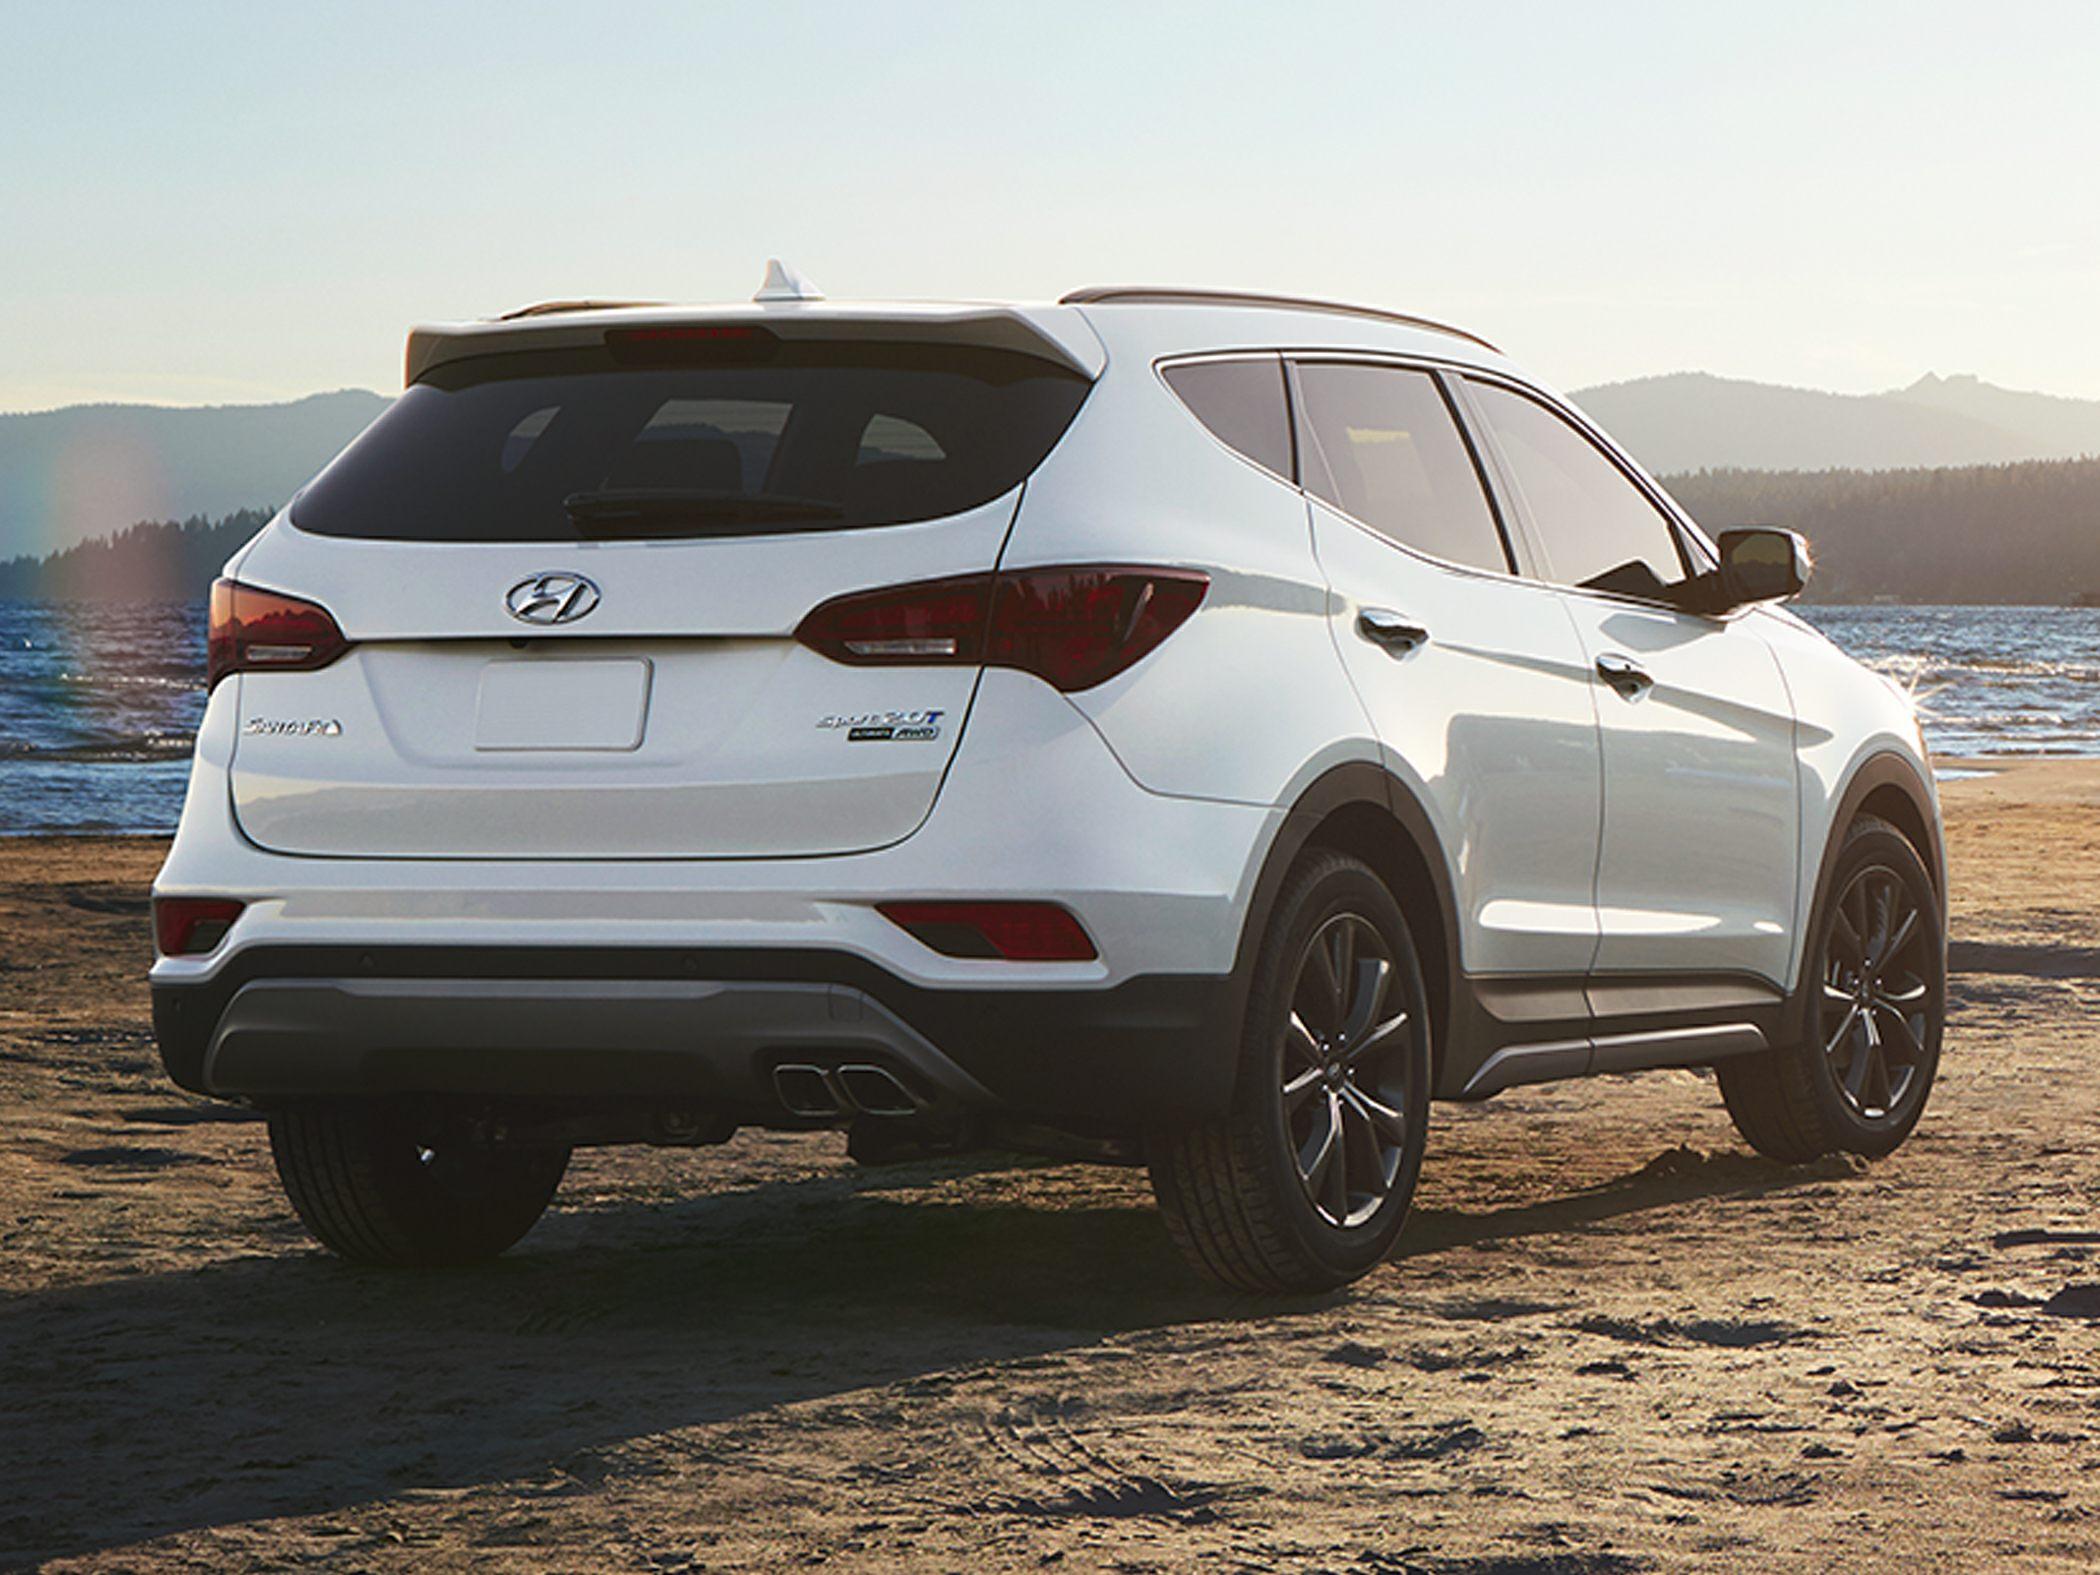 2017 Hyundai Santa Fe Sport Styles Amp Features Highlights